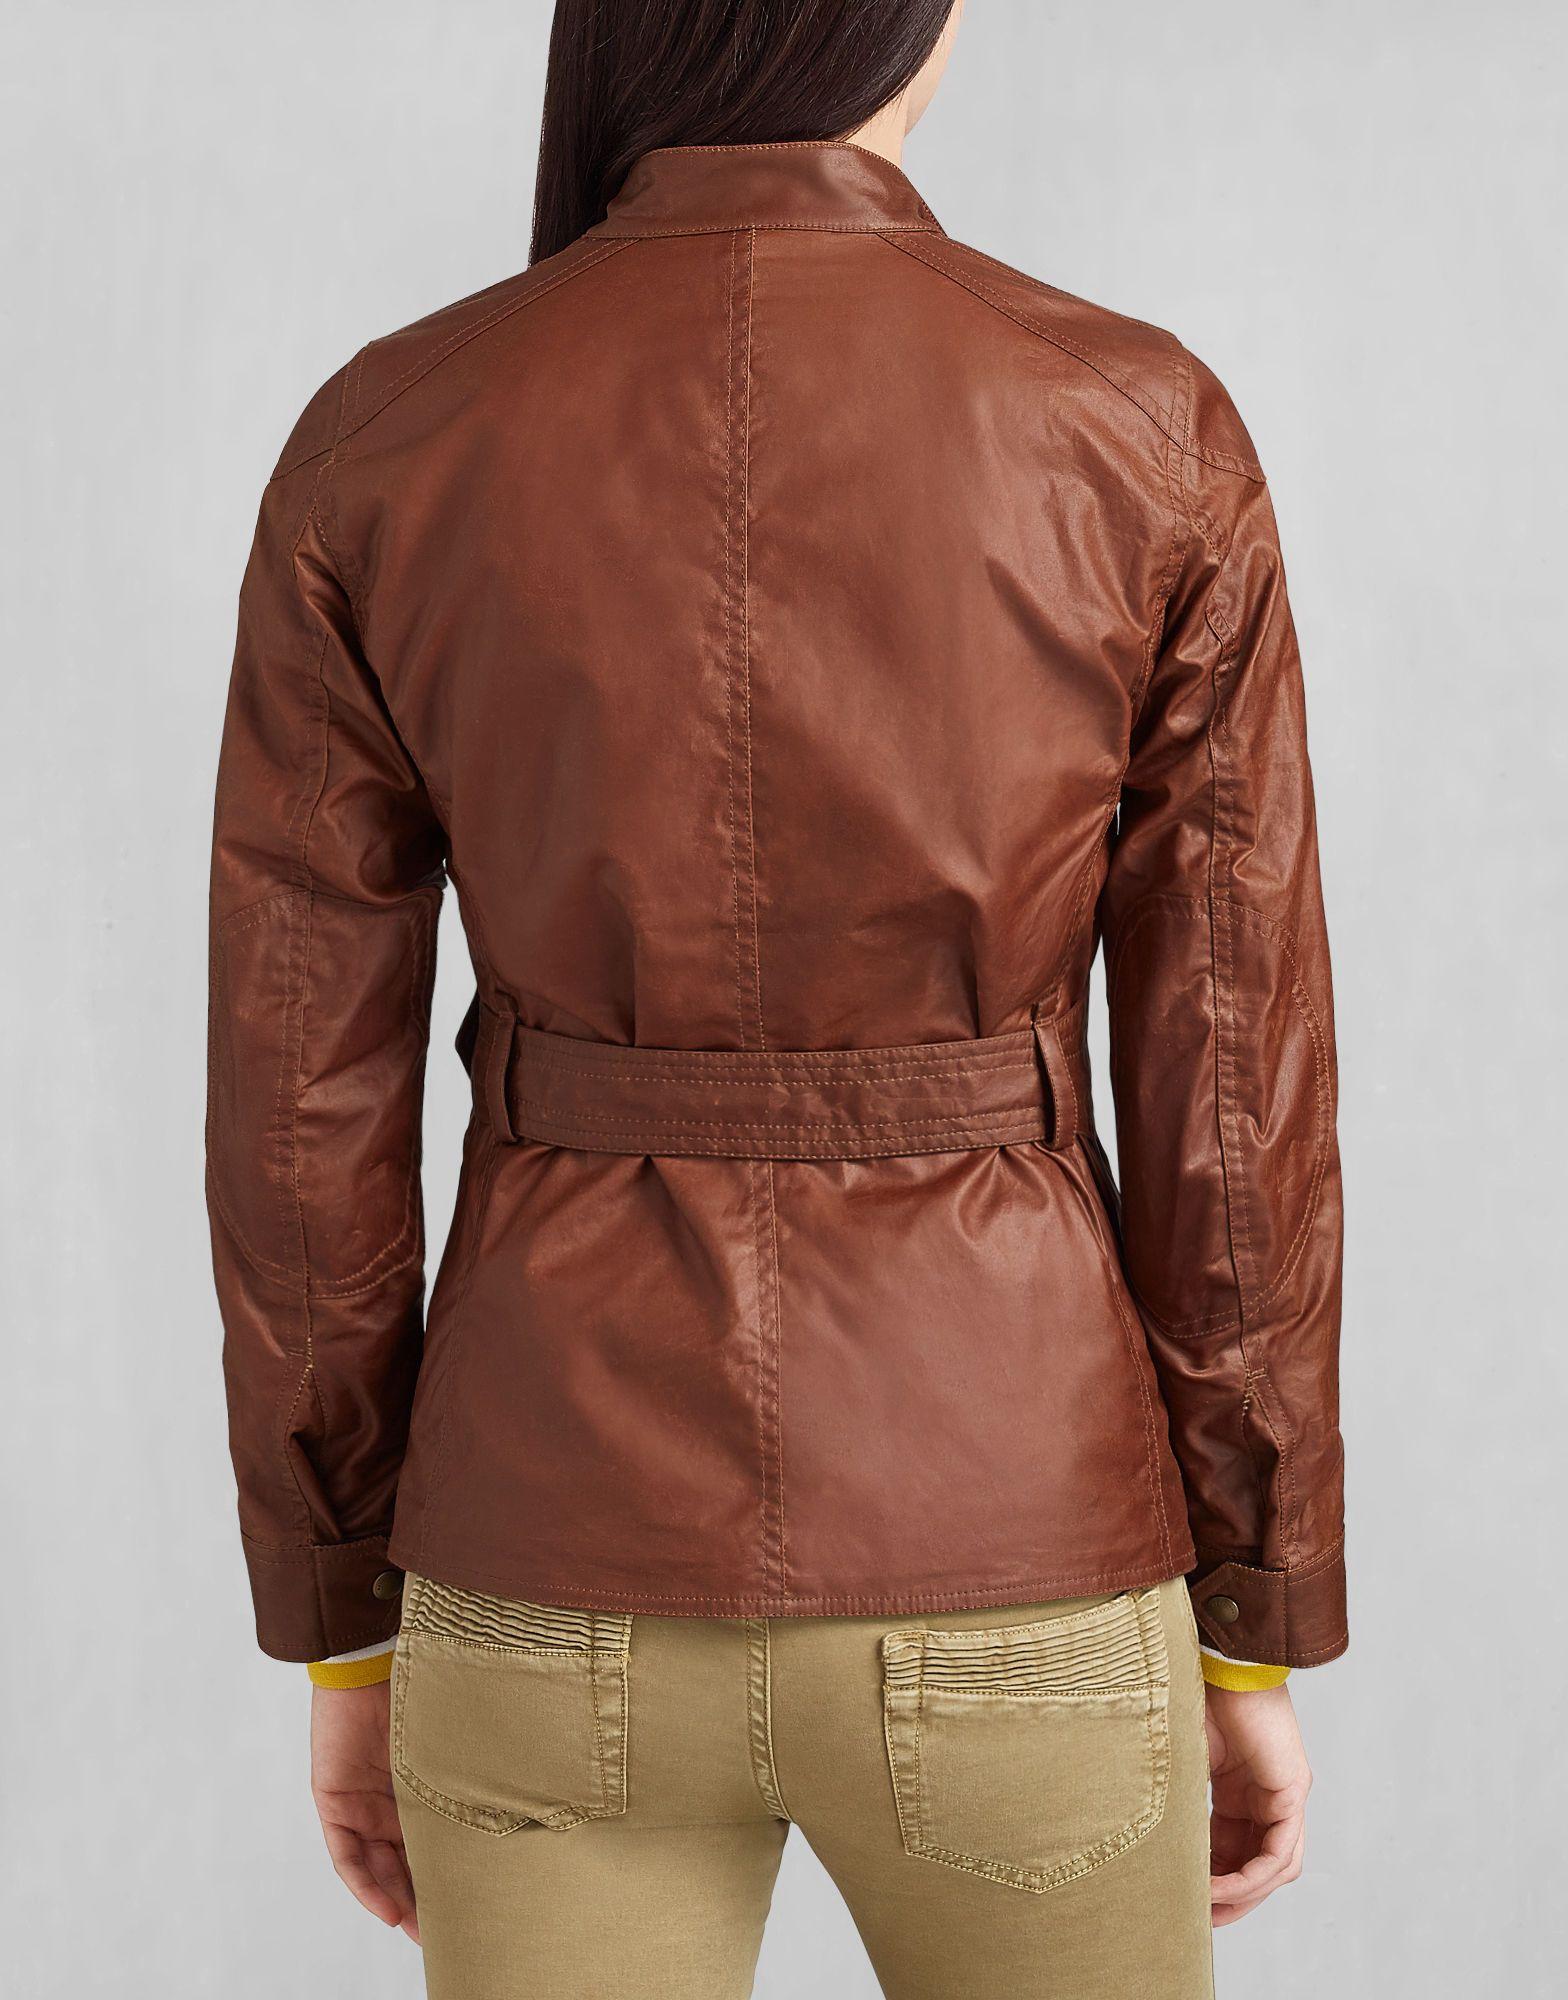 Roadmaster Jacket - Burnt Brown Waxed Cotton Waxed Cotton